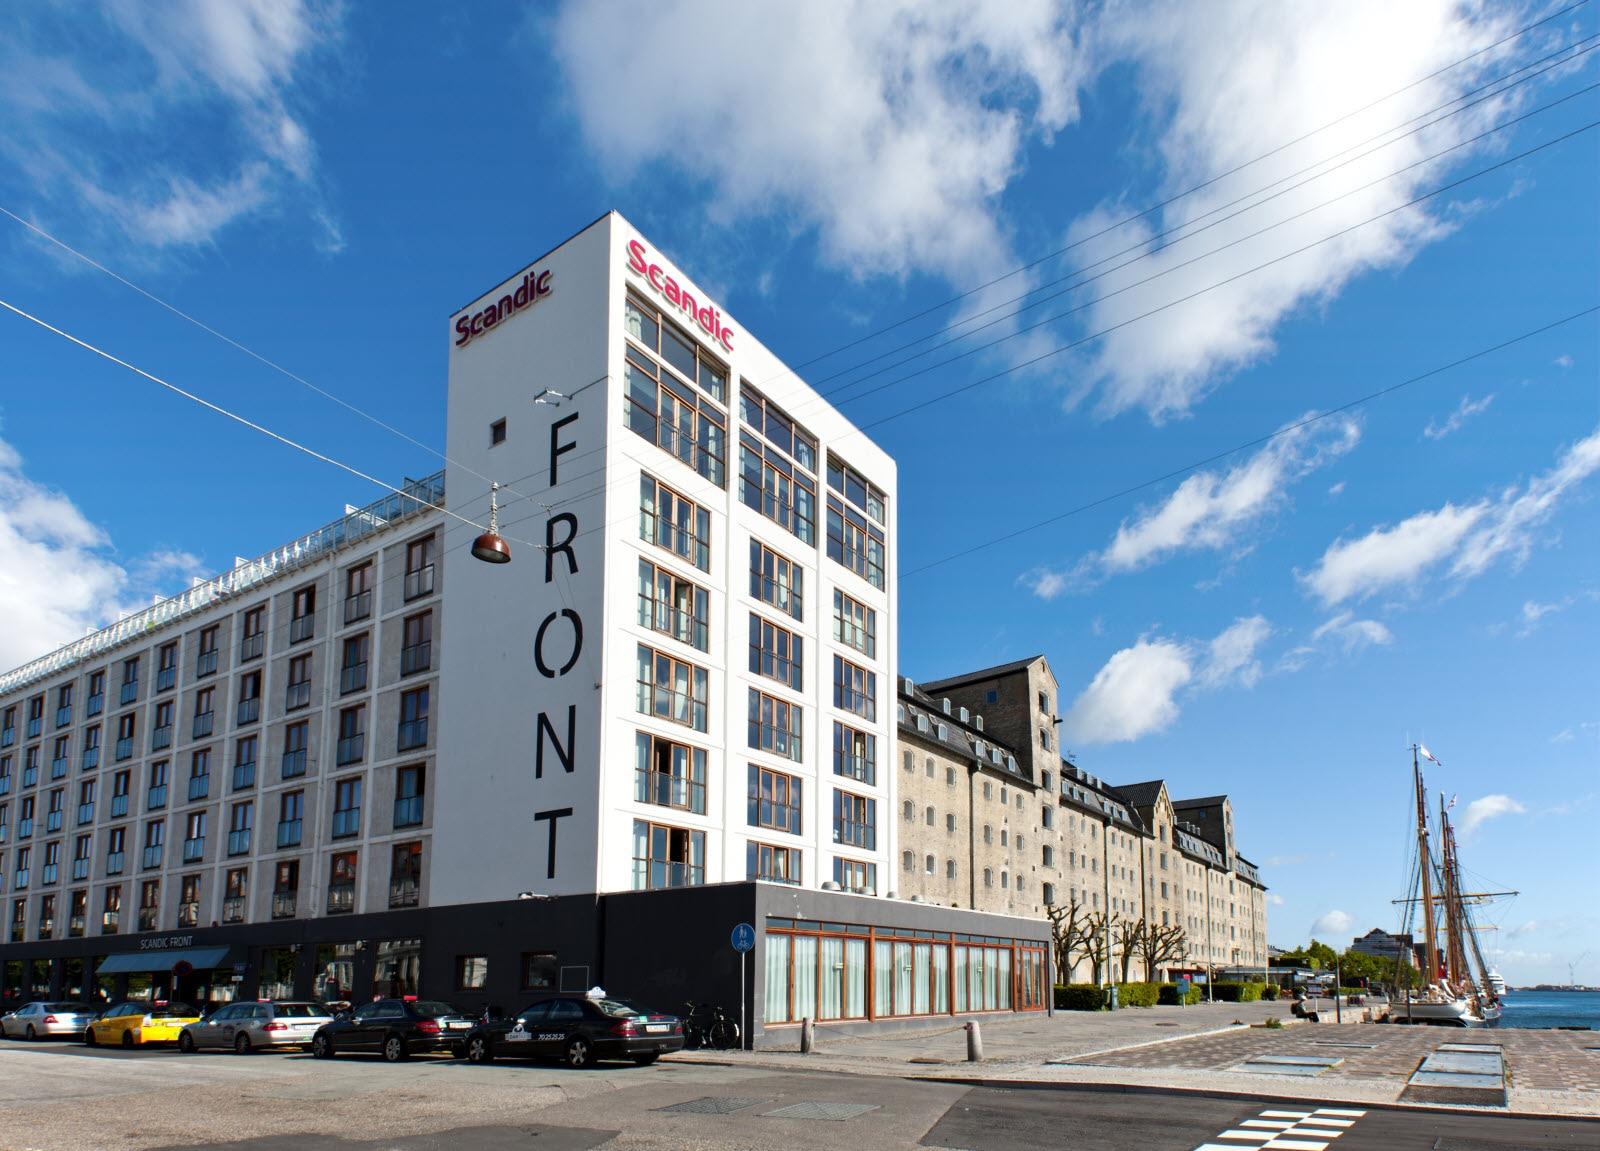 scandic front hotel copenhagen scandic hotels. Black Bedroom Furniture Sets. Home Design Ideas